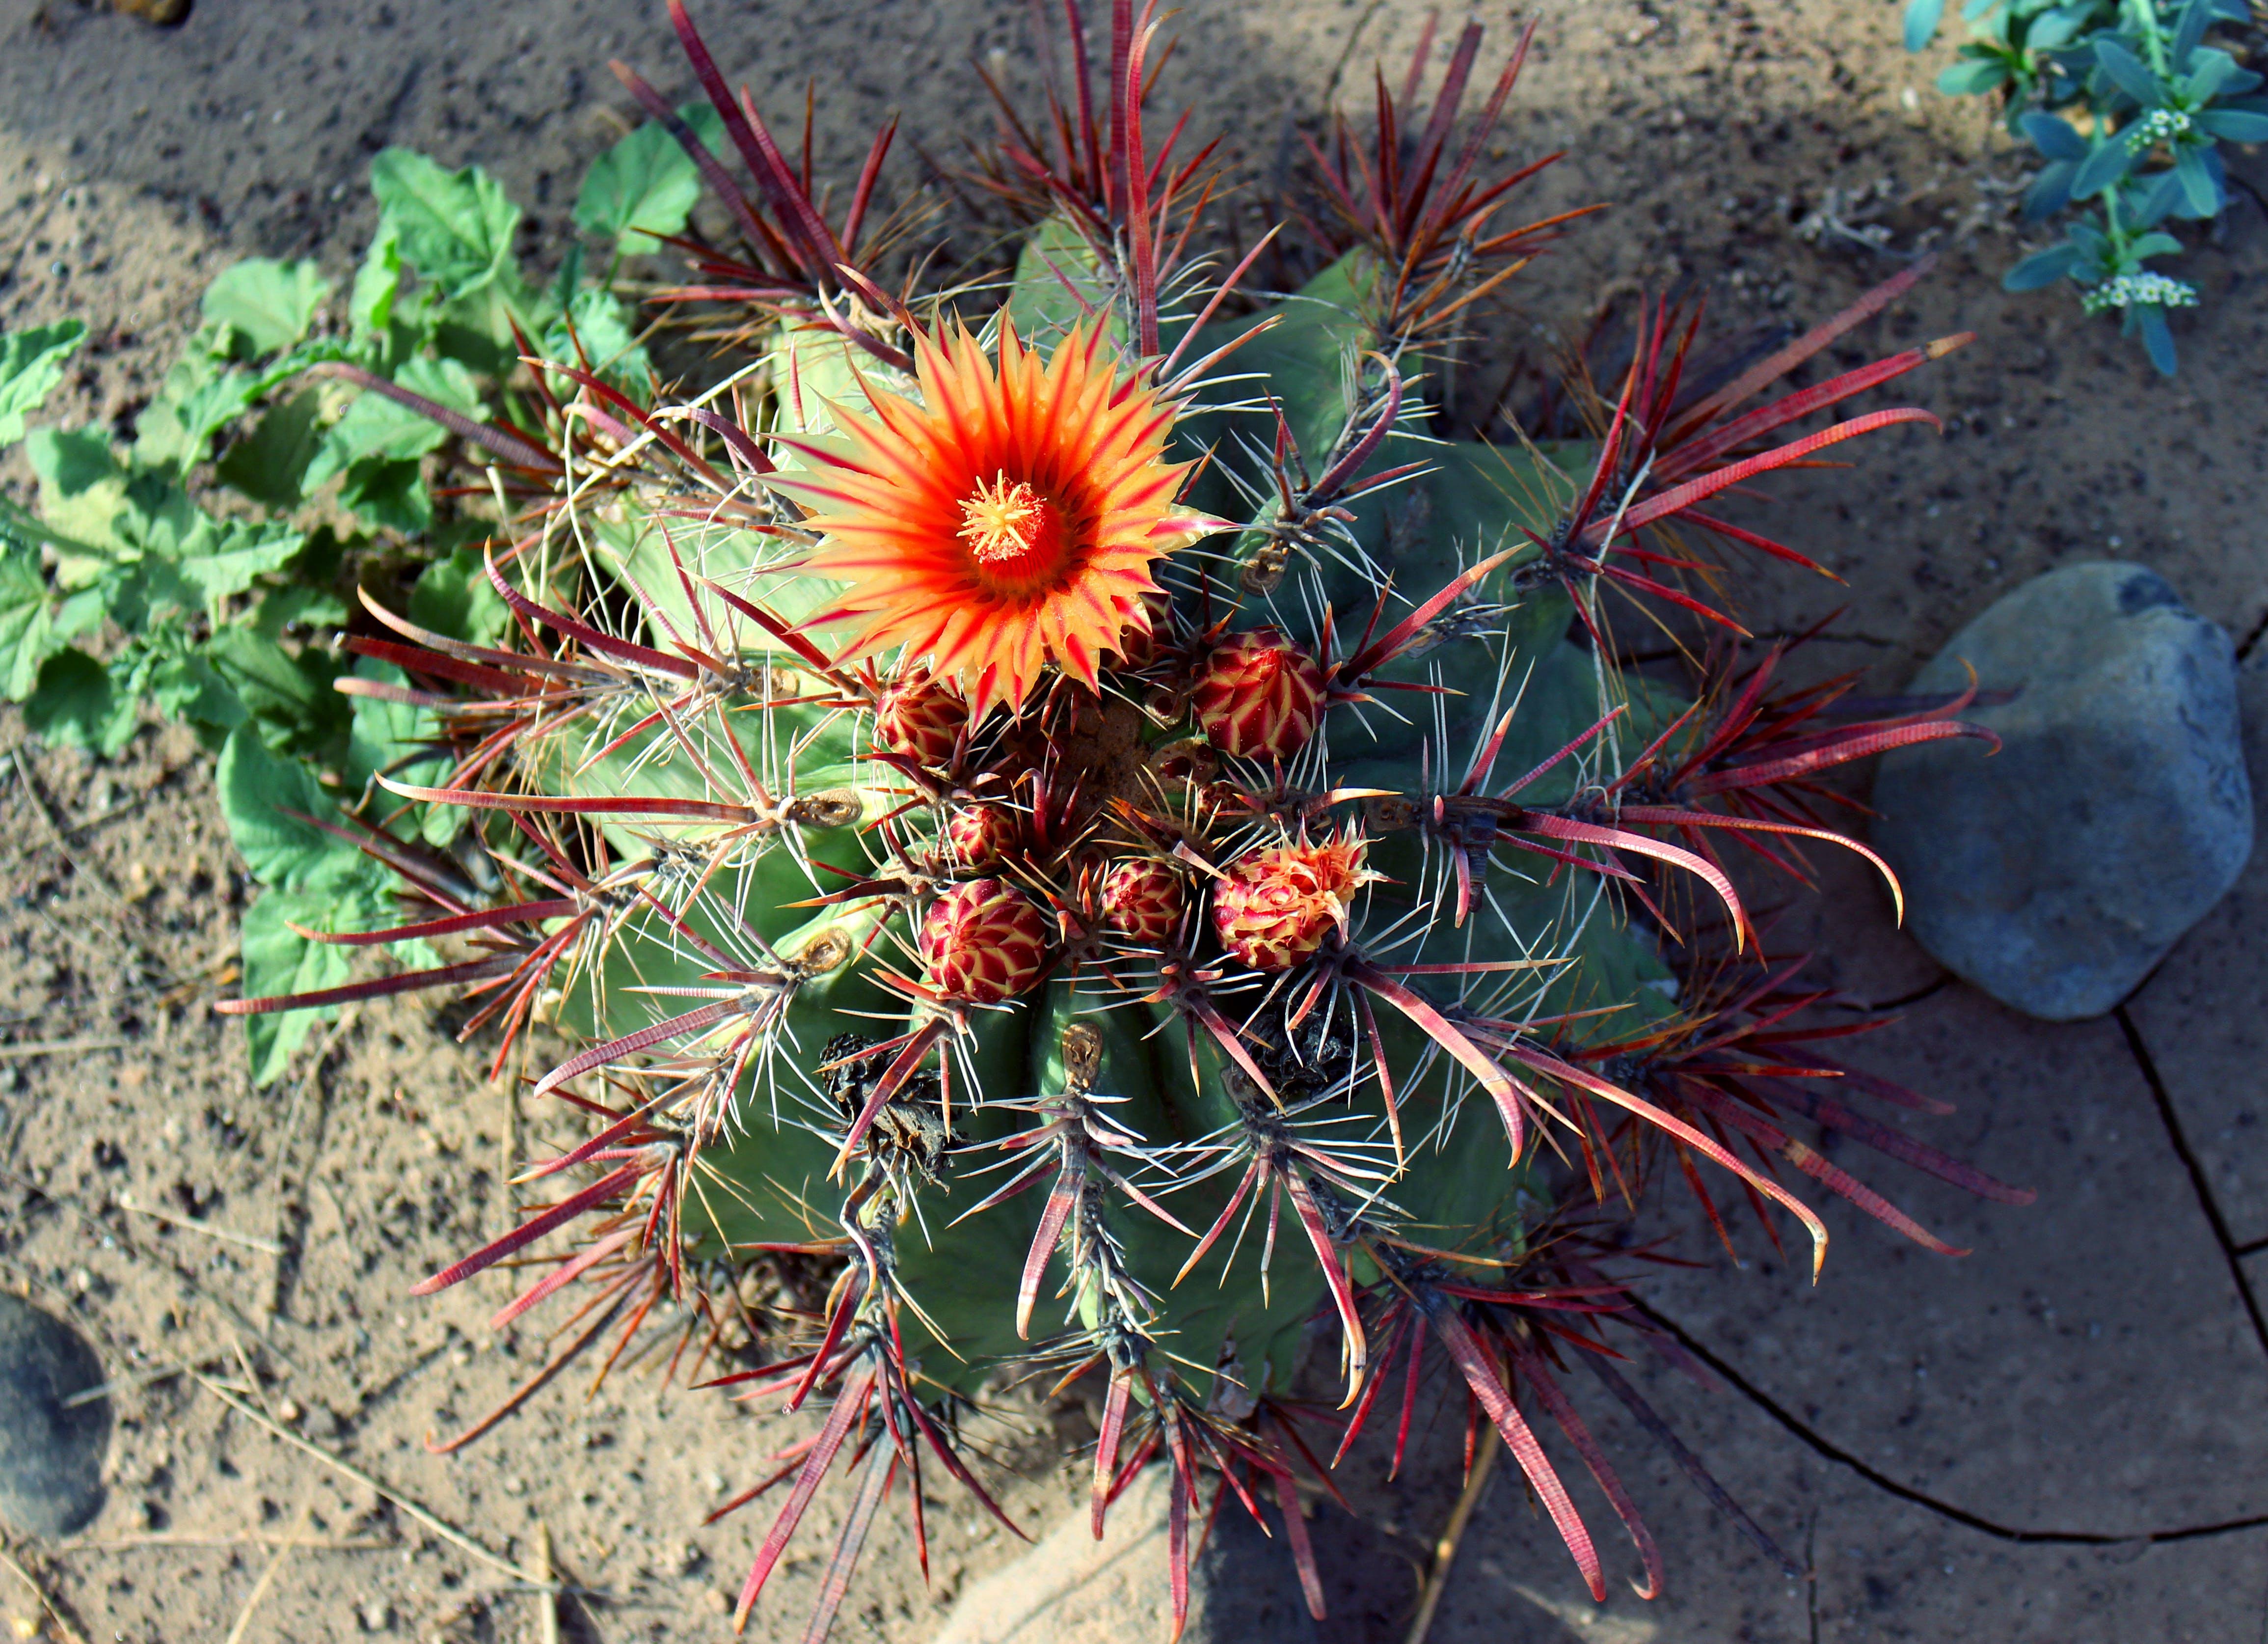 Free stock photo of Blooming cactus, cactus, desert, flower